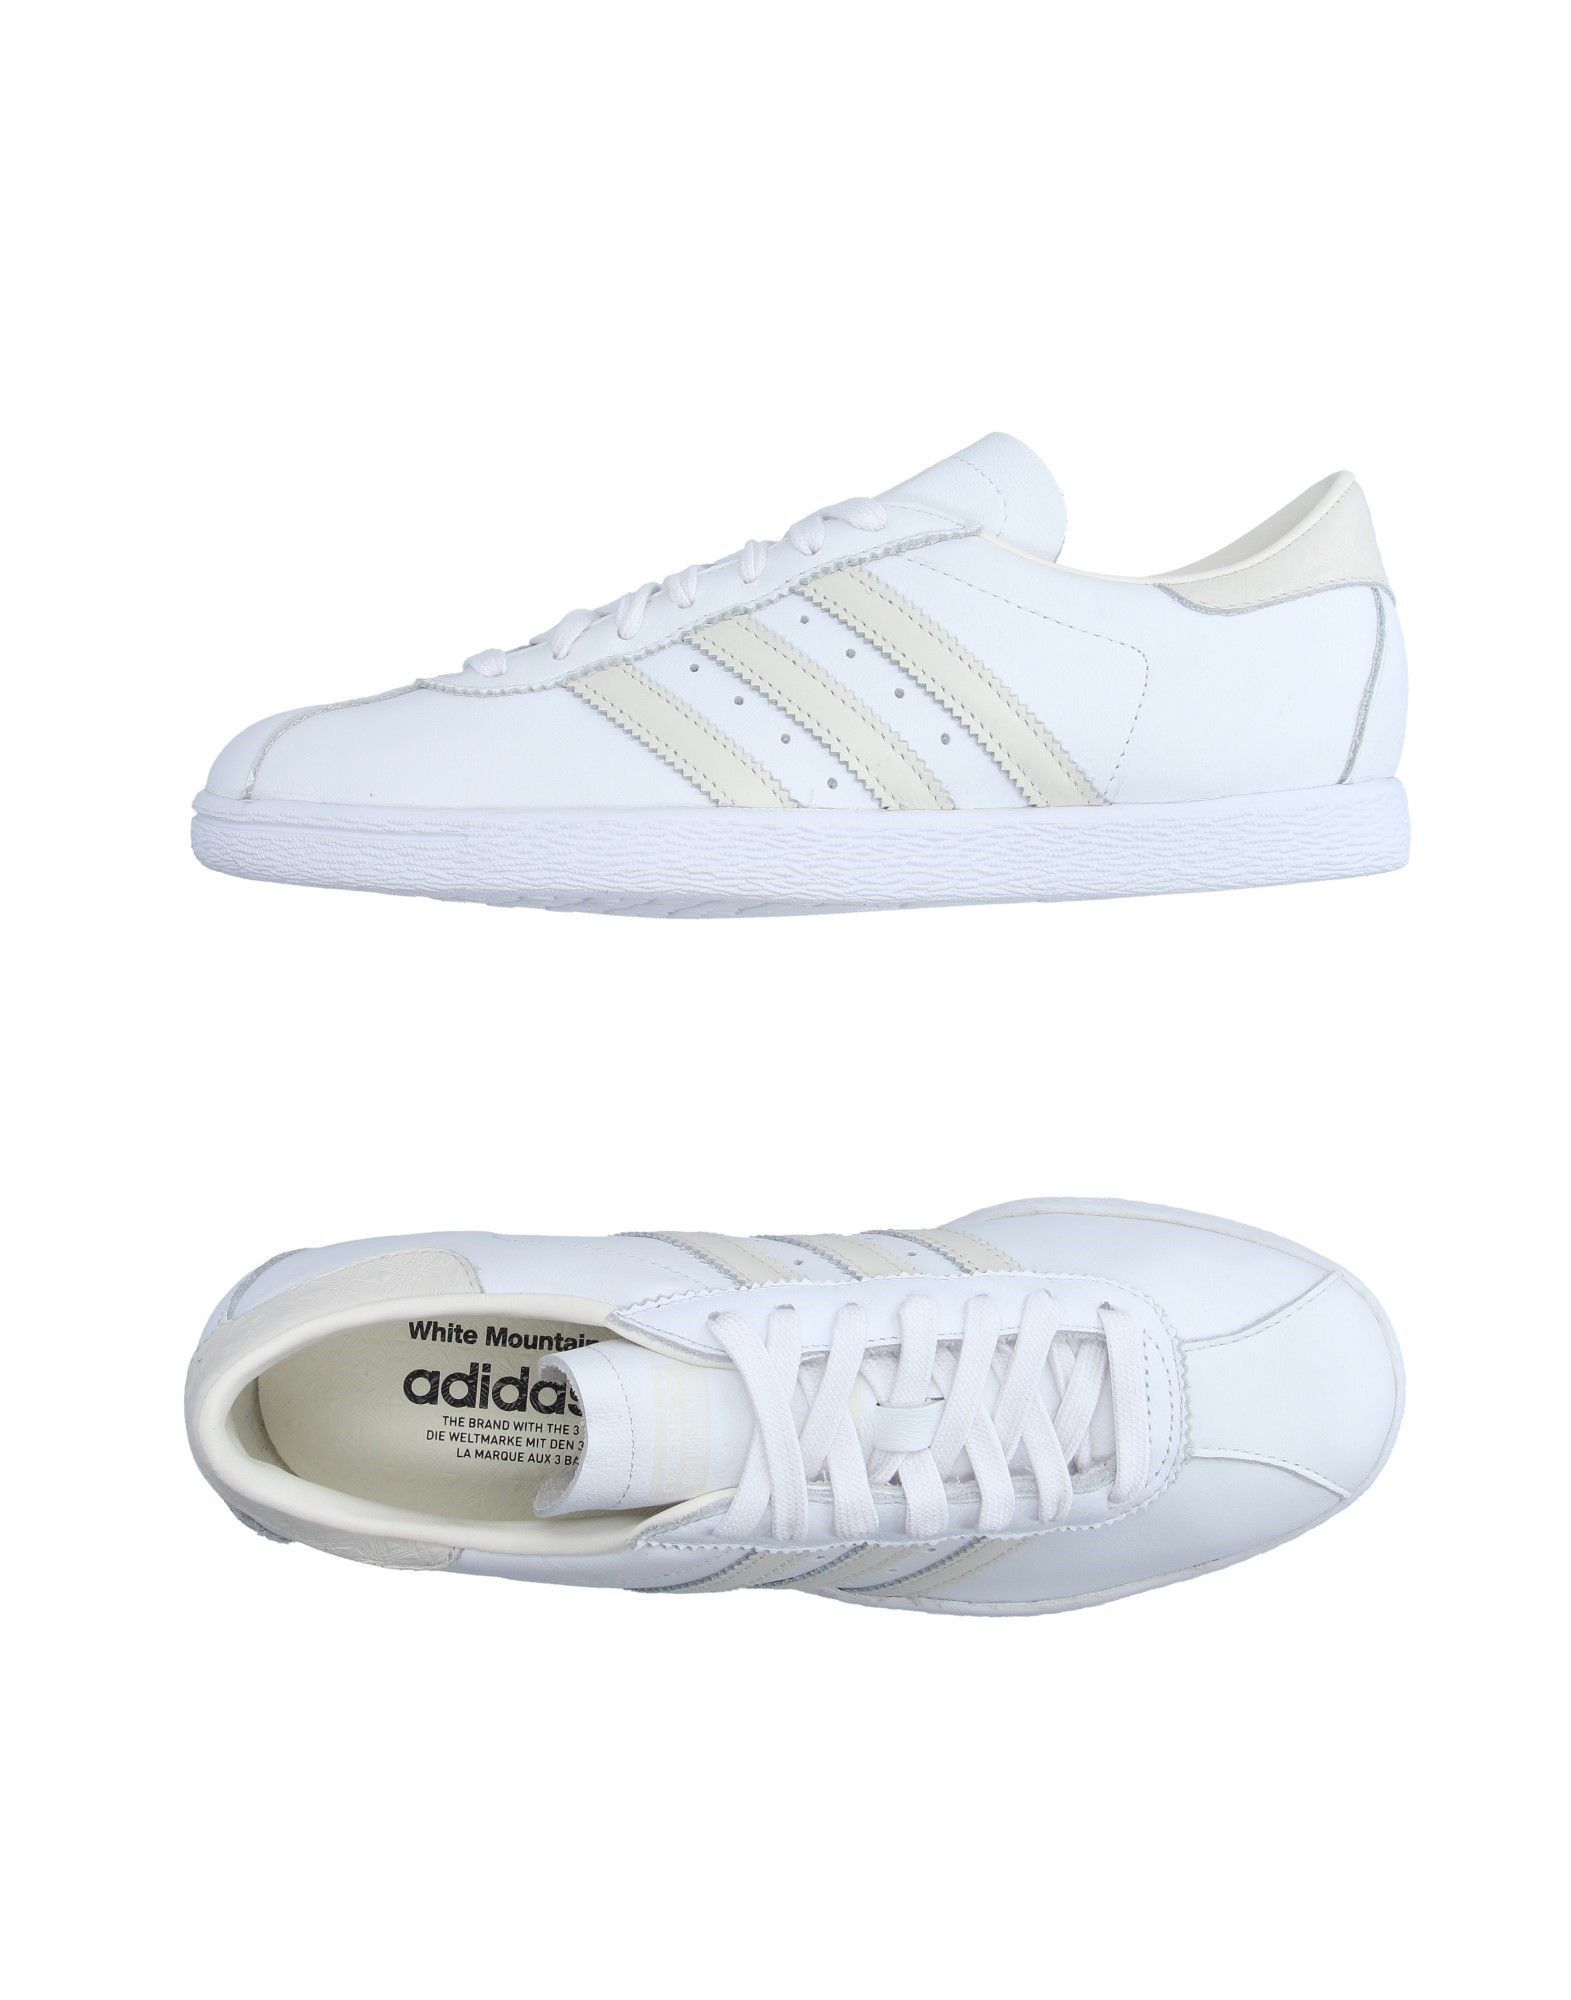 Adidas Originals En Montagne Blanc Bas-tops Et Chaussures De Sport rqWyCnX